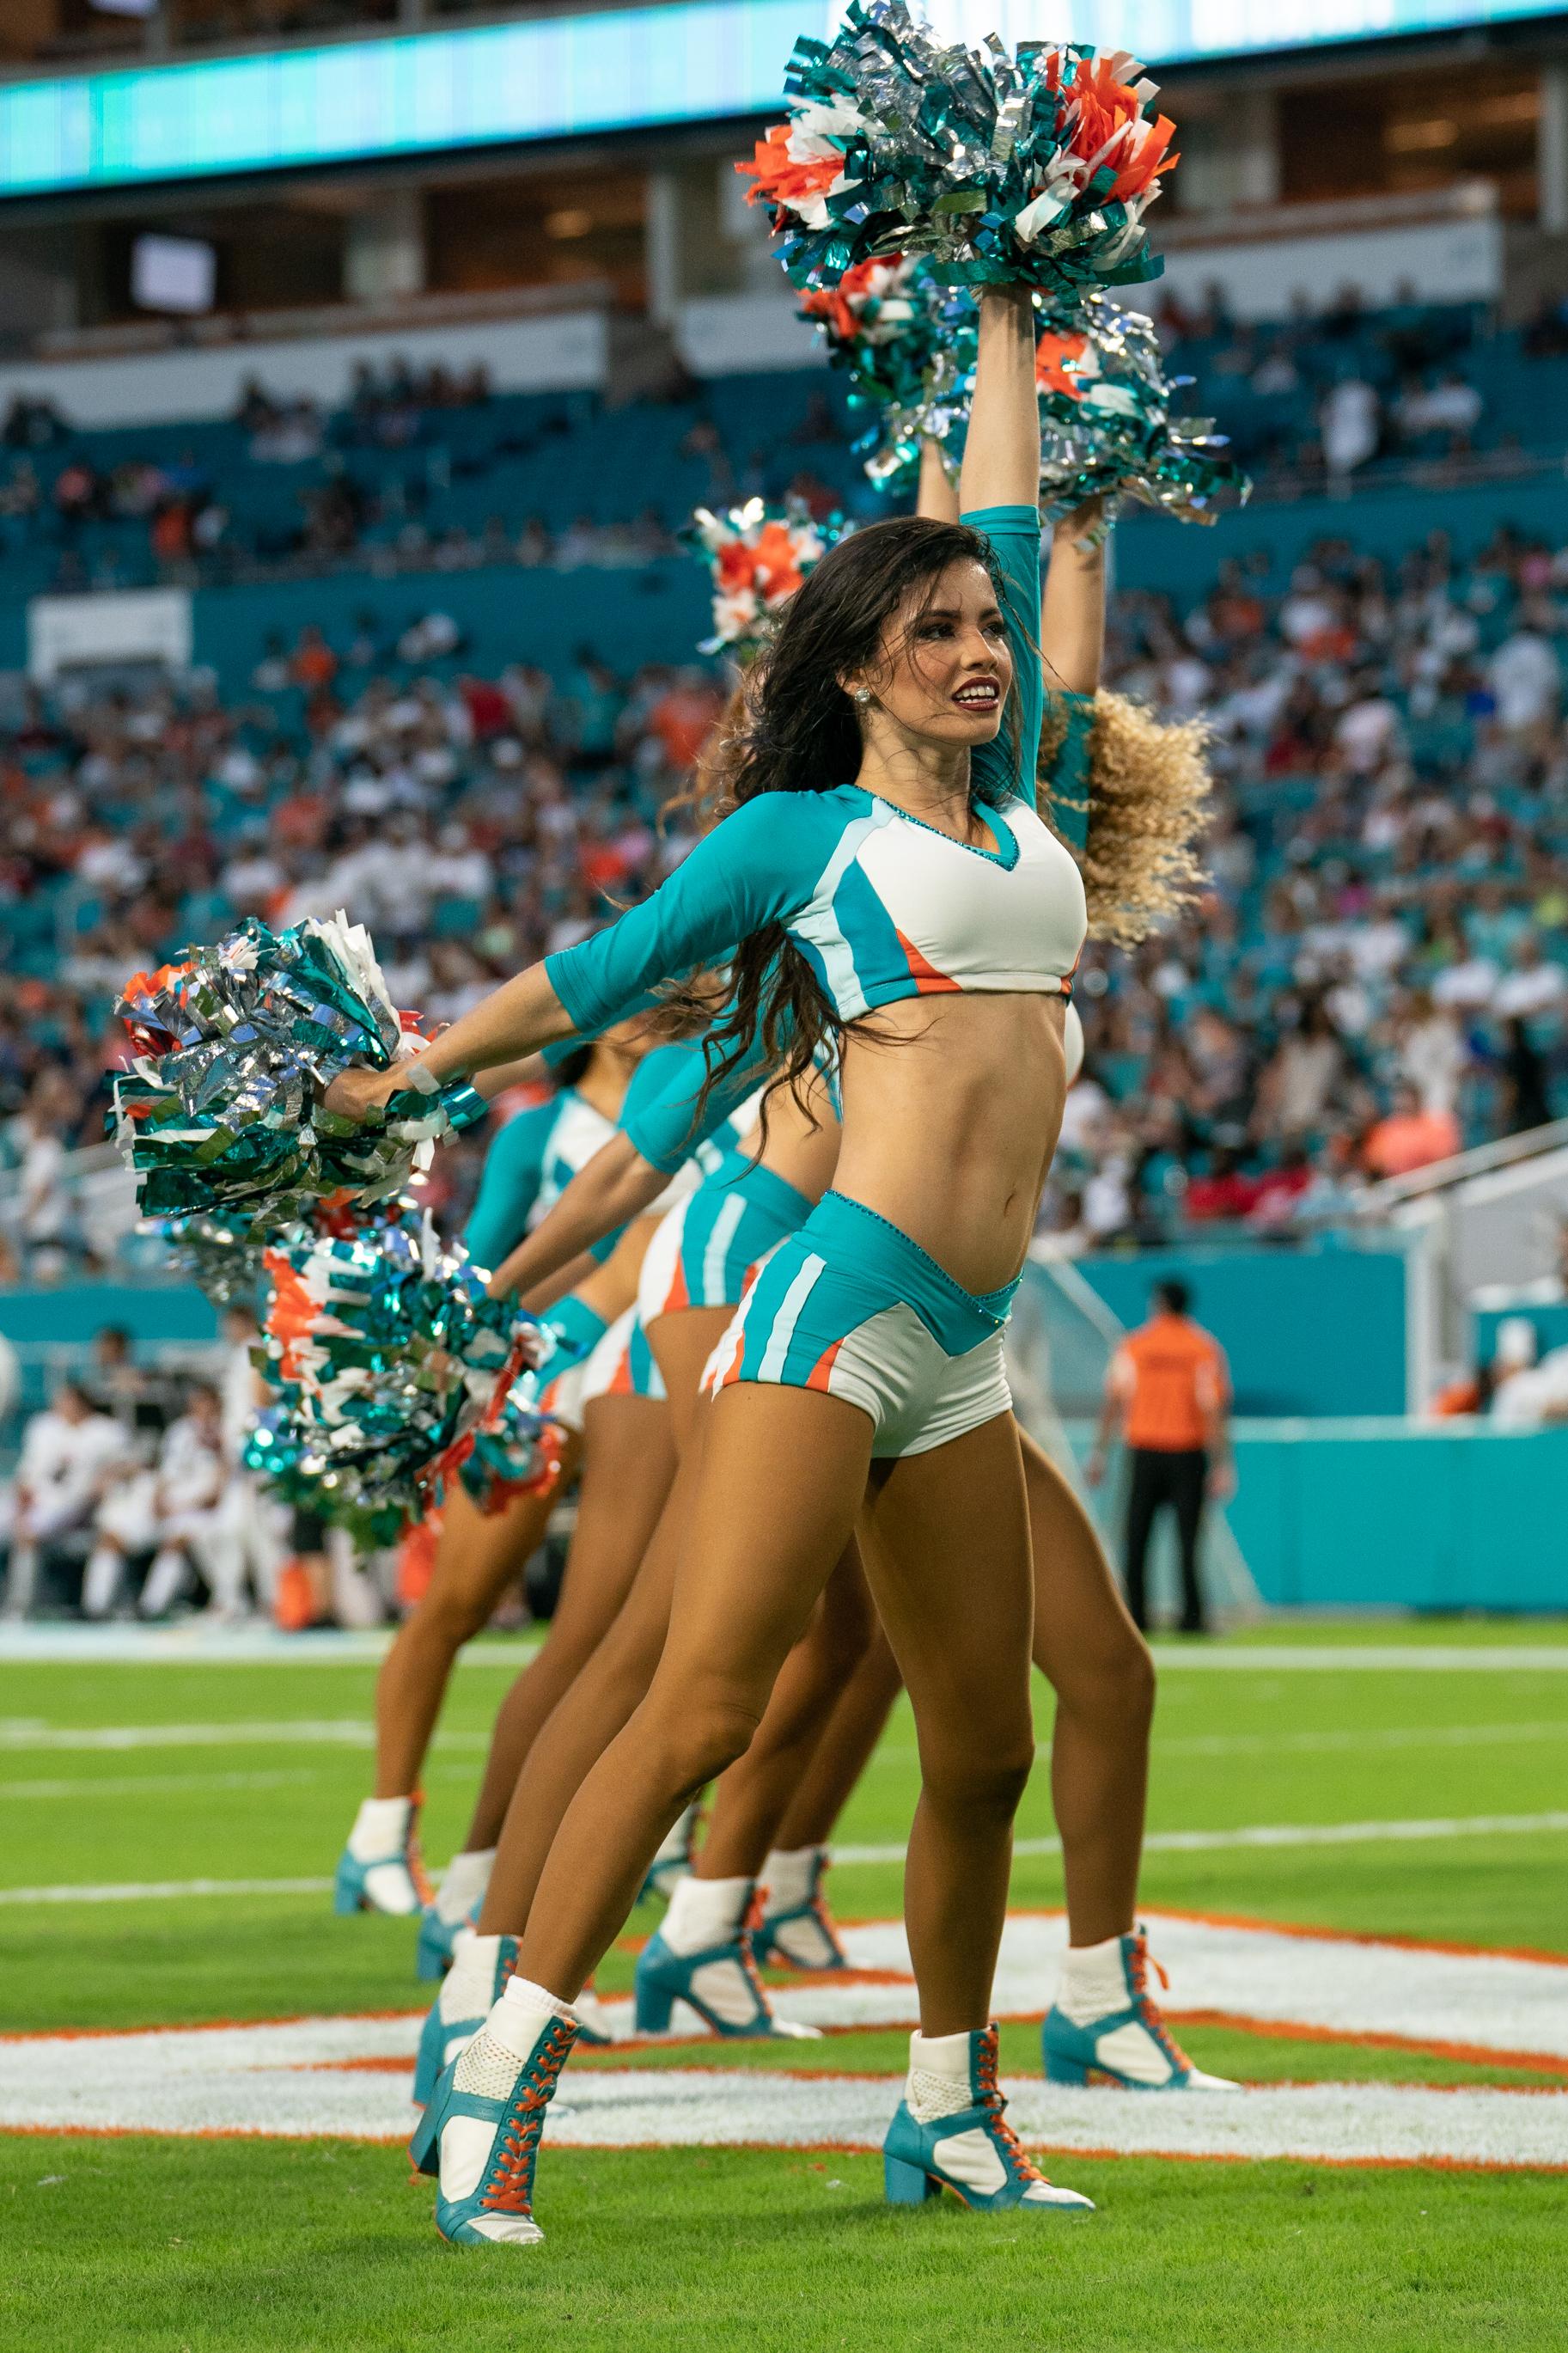 NFL: AUG 21 Preseason - Falcons at Dolphins